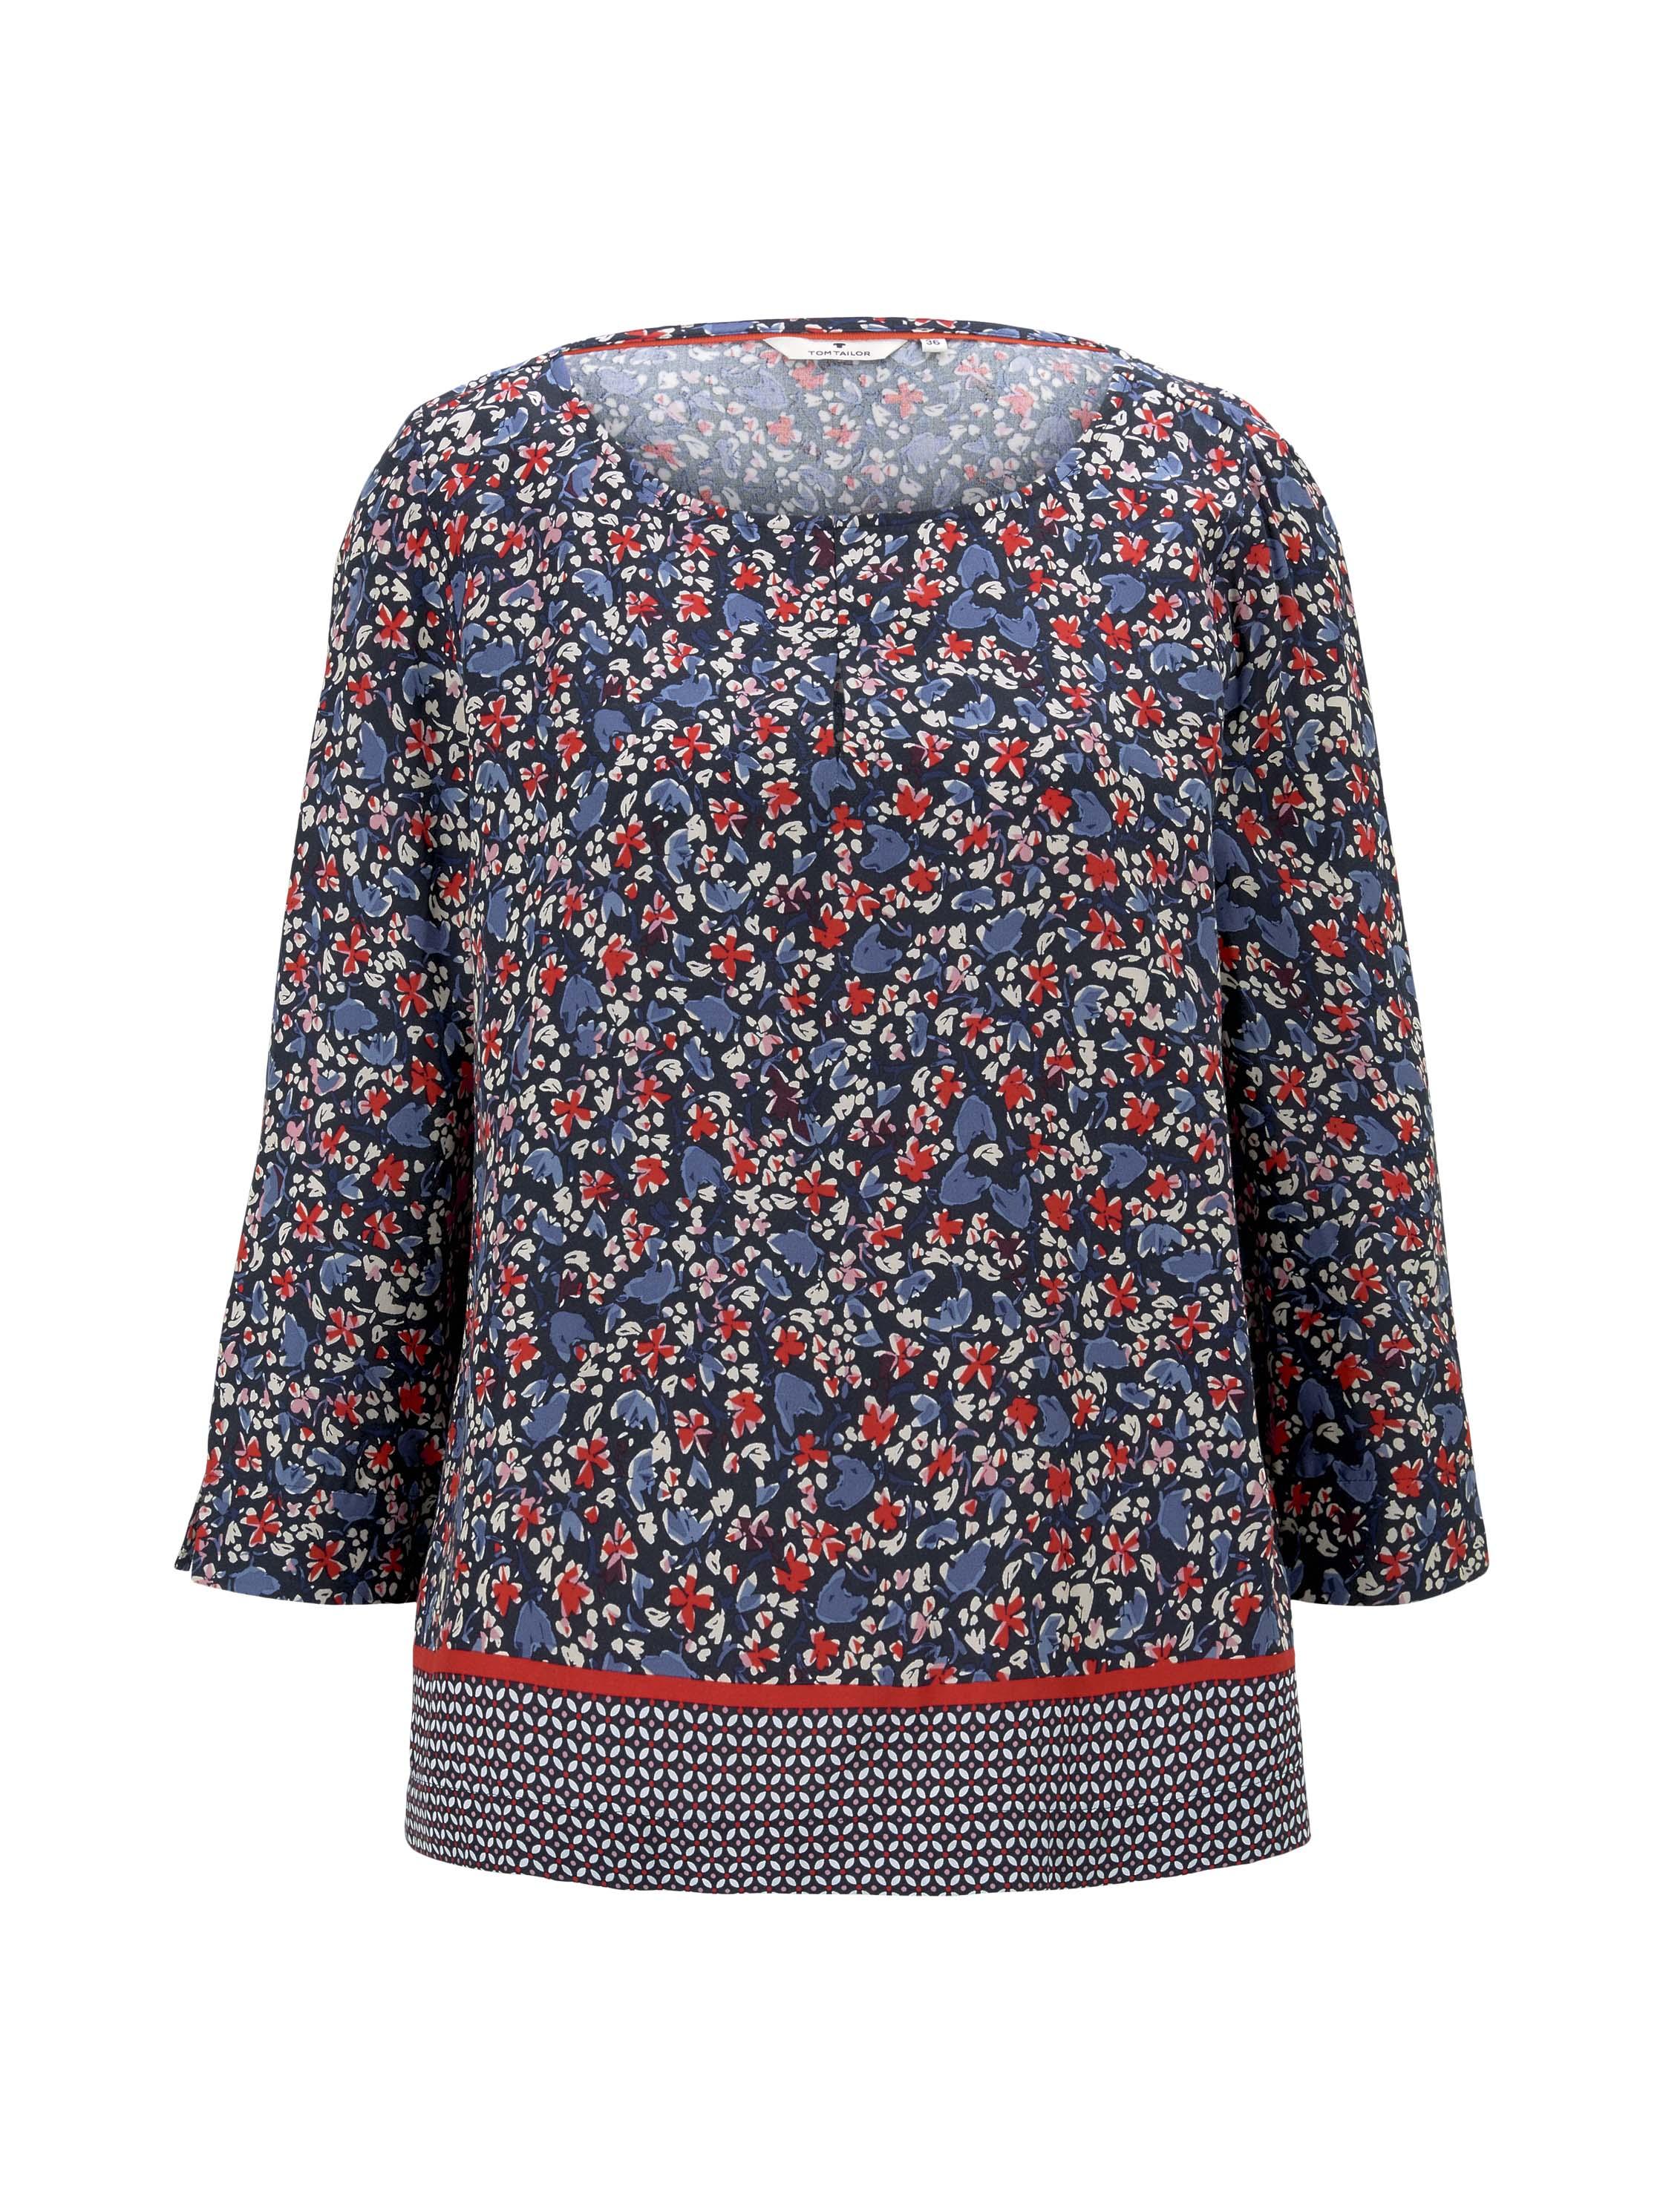 blouse print mix, navy flower design